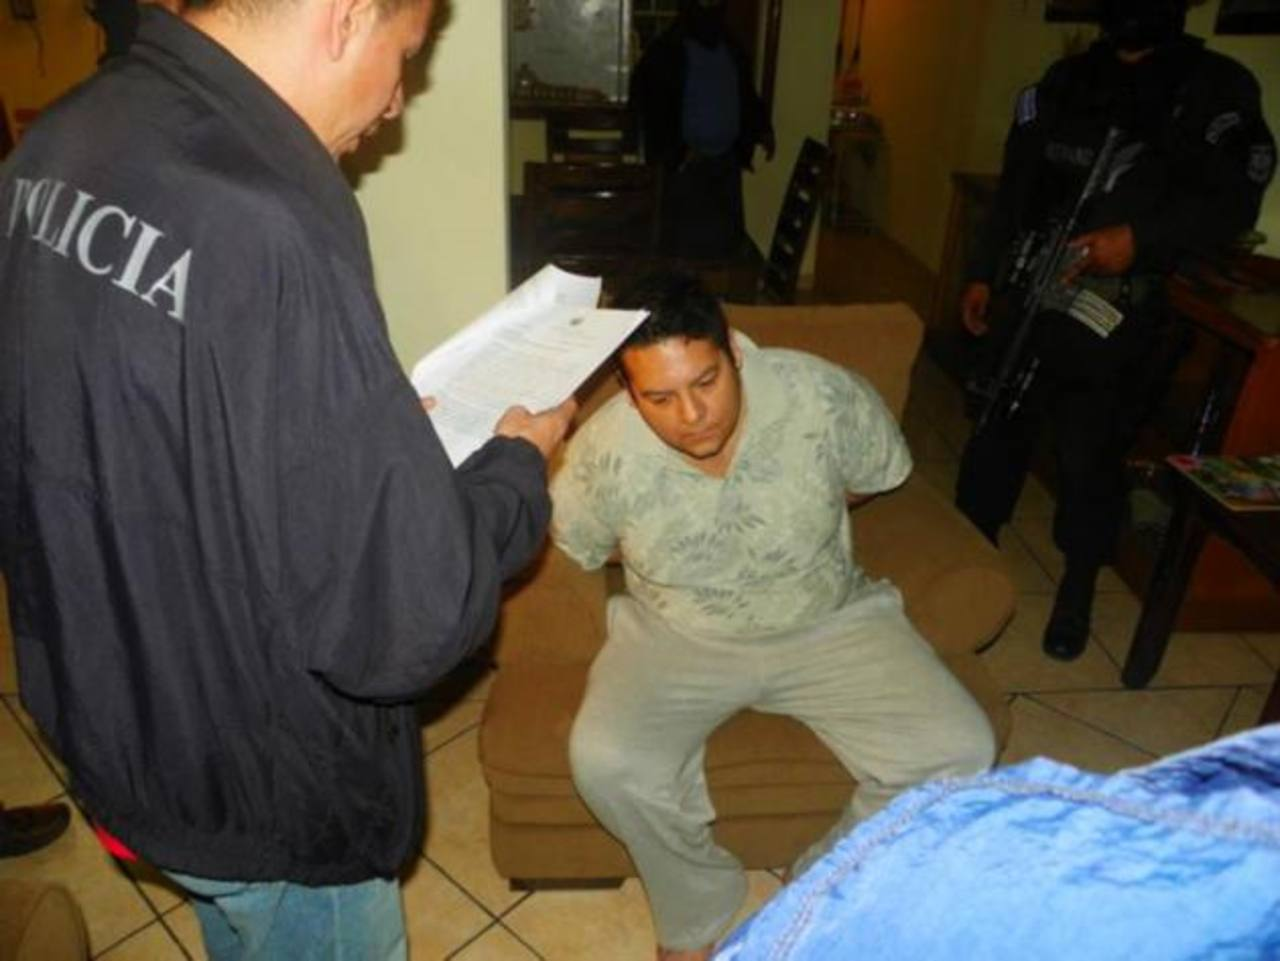 Fiscal y capitán relacionados a banda robacarros estarán en libertad al pagar fianza